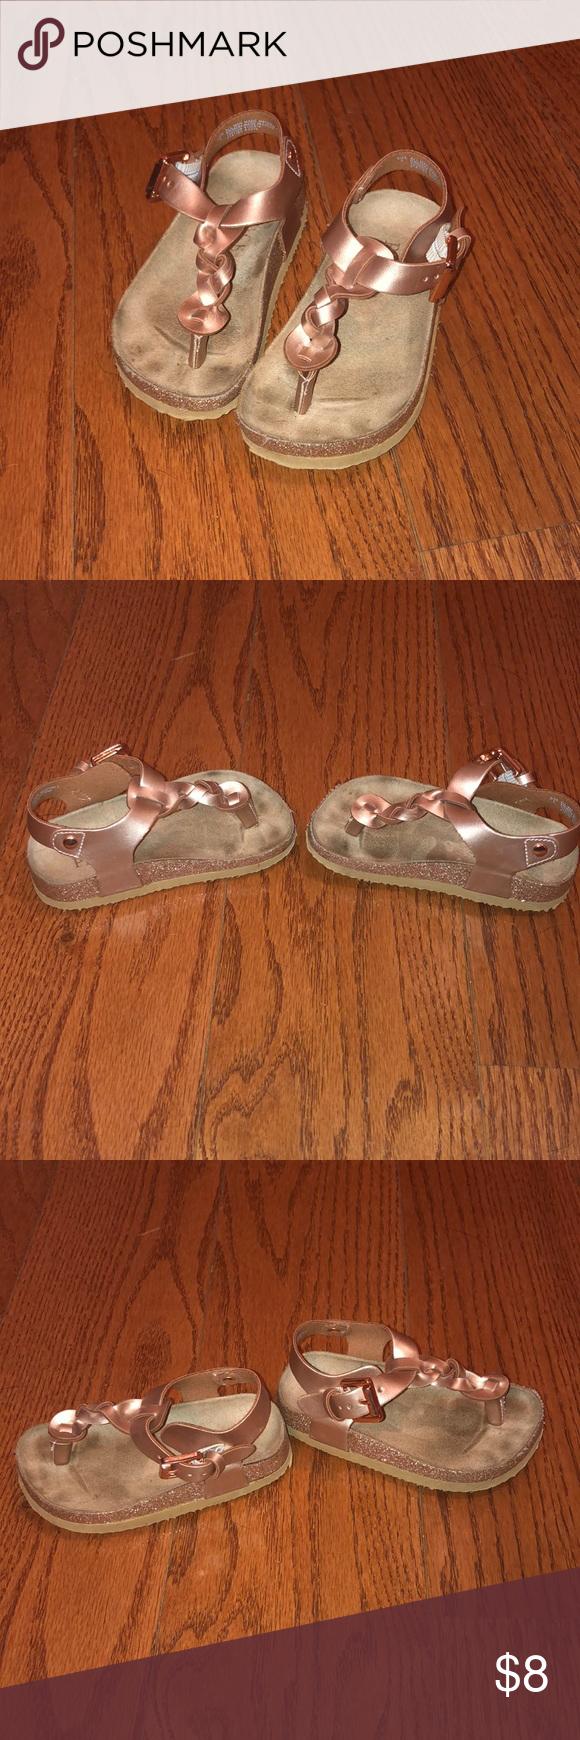 3/$10 Children's place rose gold sandals